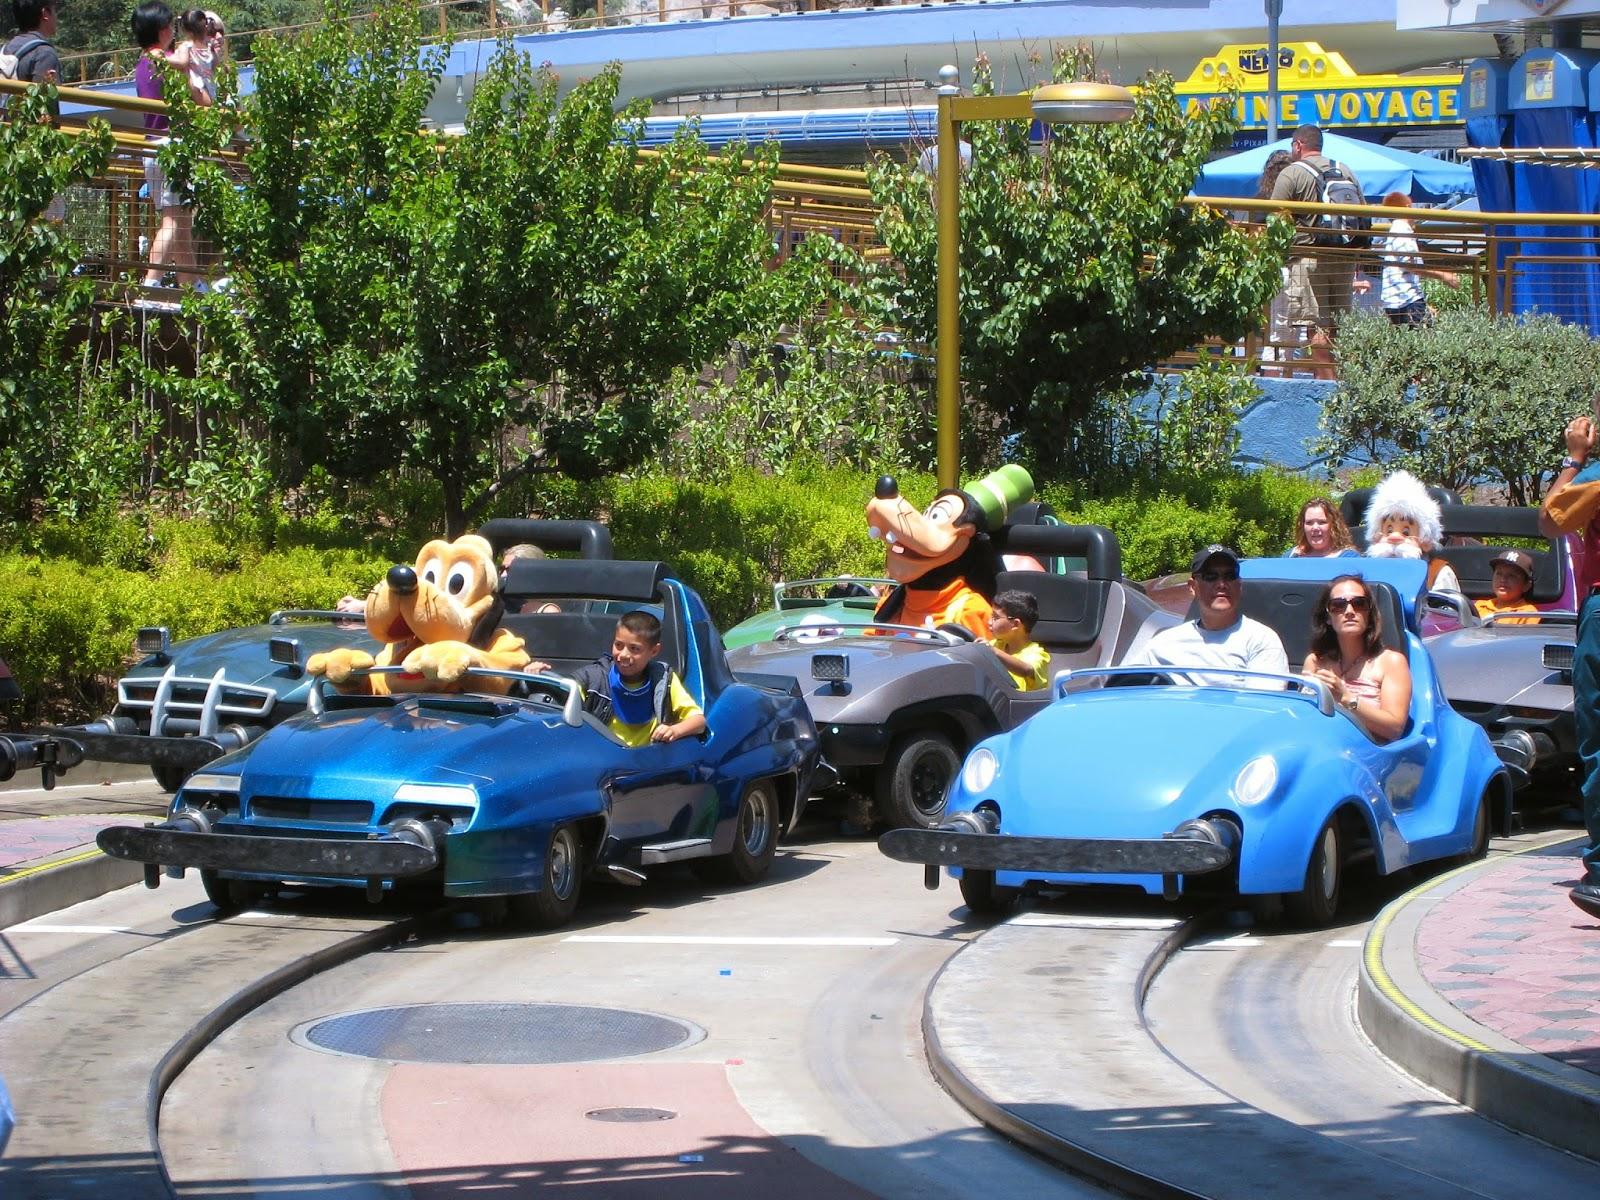 Mickey Mutineers Attraction Clashin Autopia Vs